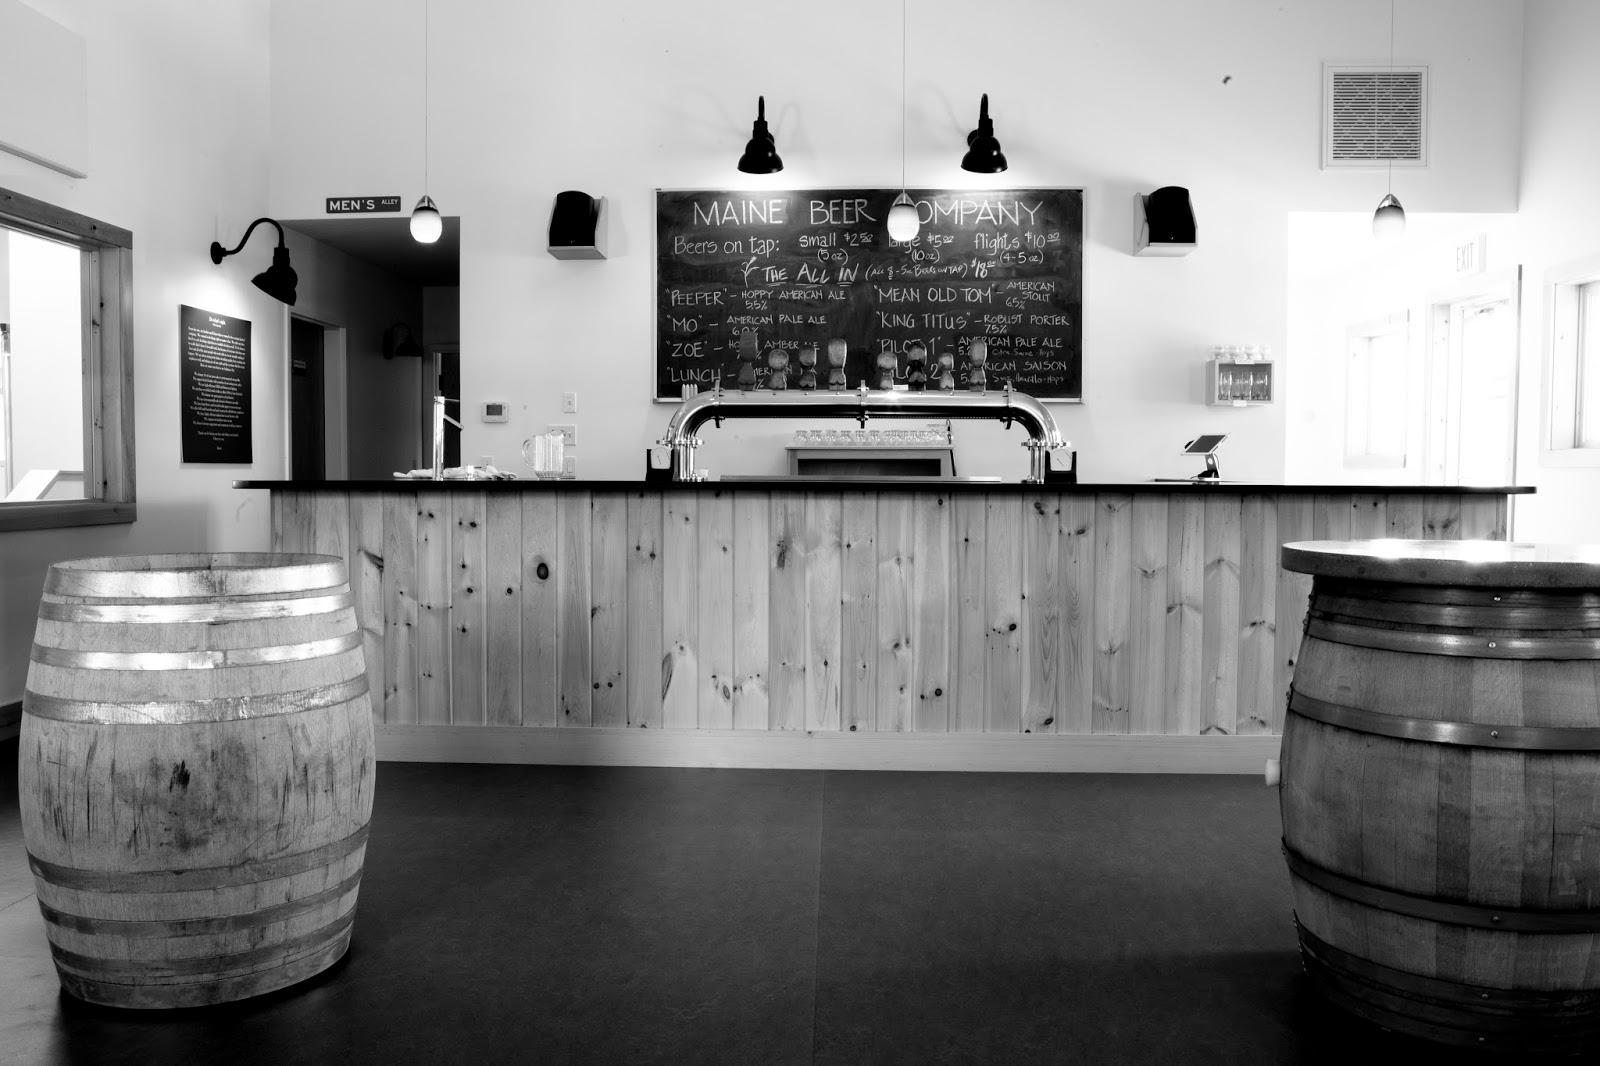 White apron ale - Freeport Taproom Photo Credit Nathan Eldridge